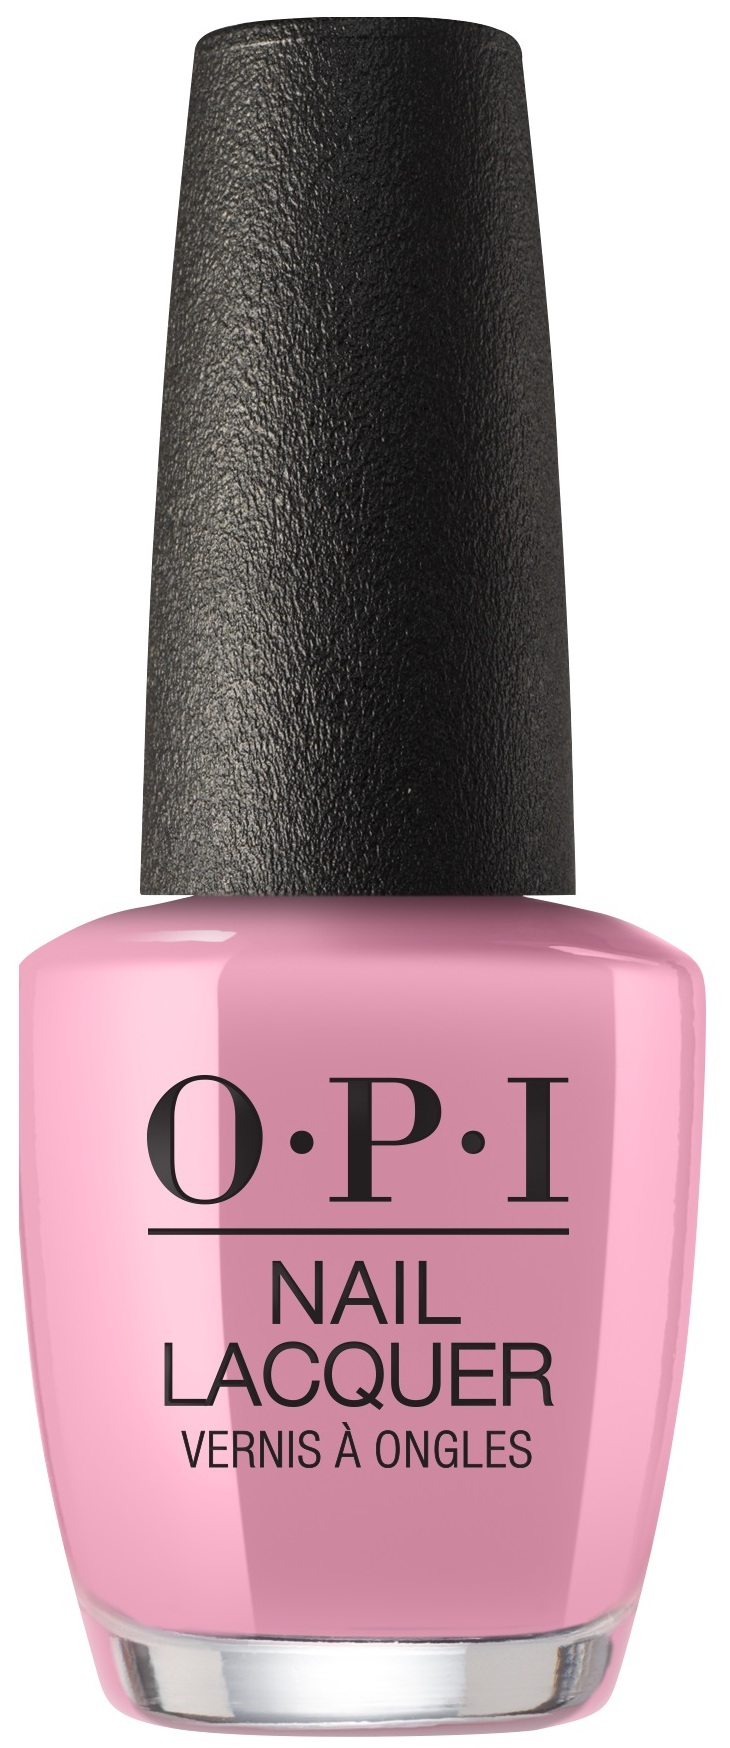 OPI Лак для ногтей / Rice Rice Baby Nail Lacquer 15 мл фото